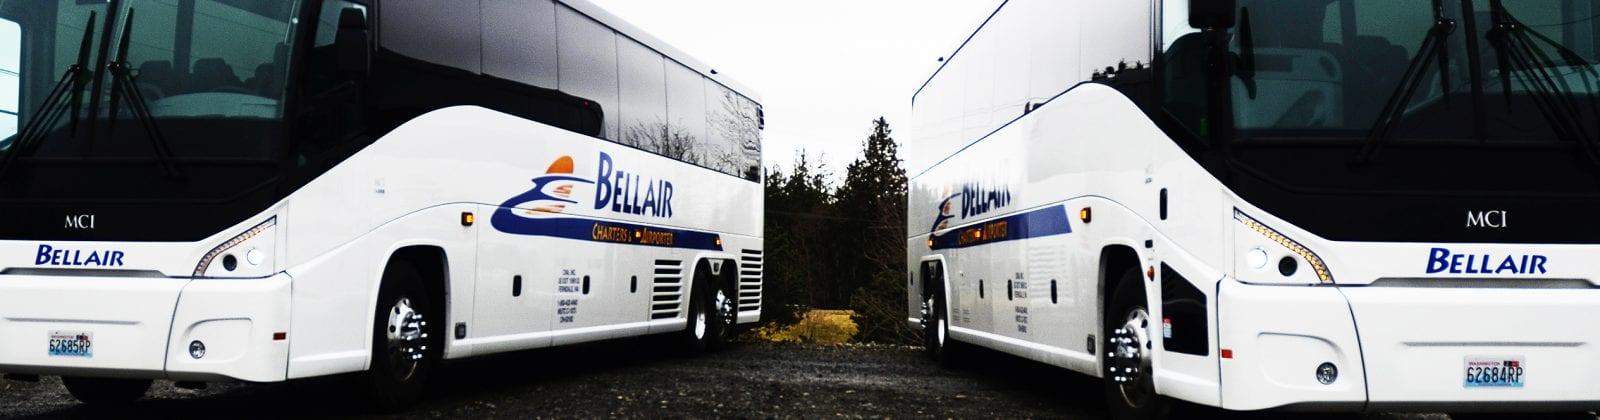 Bellair Jobs Sea-Tac Airport